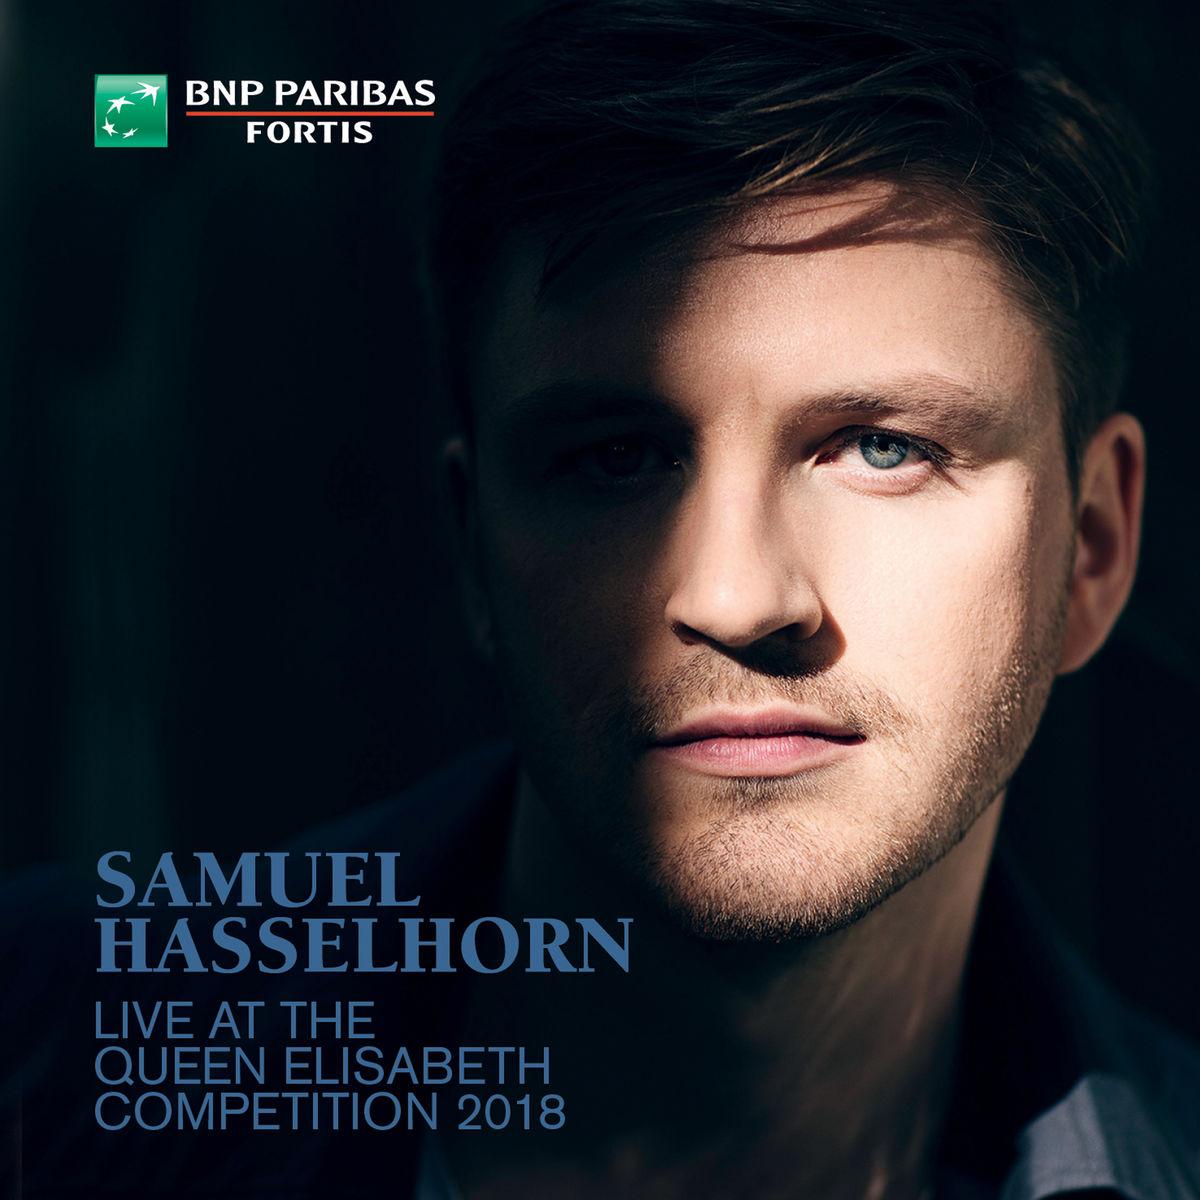 Samuel Hasselhorn - Samuel Hasselhorn Live at the Queen Elisabeth Competition 2018 (2019)